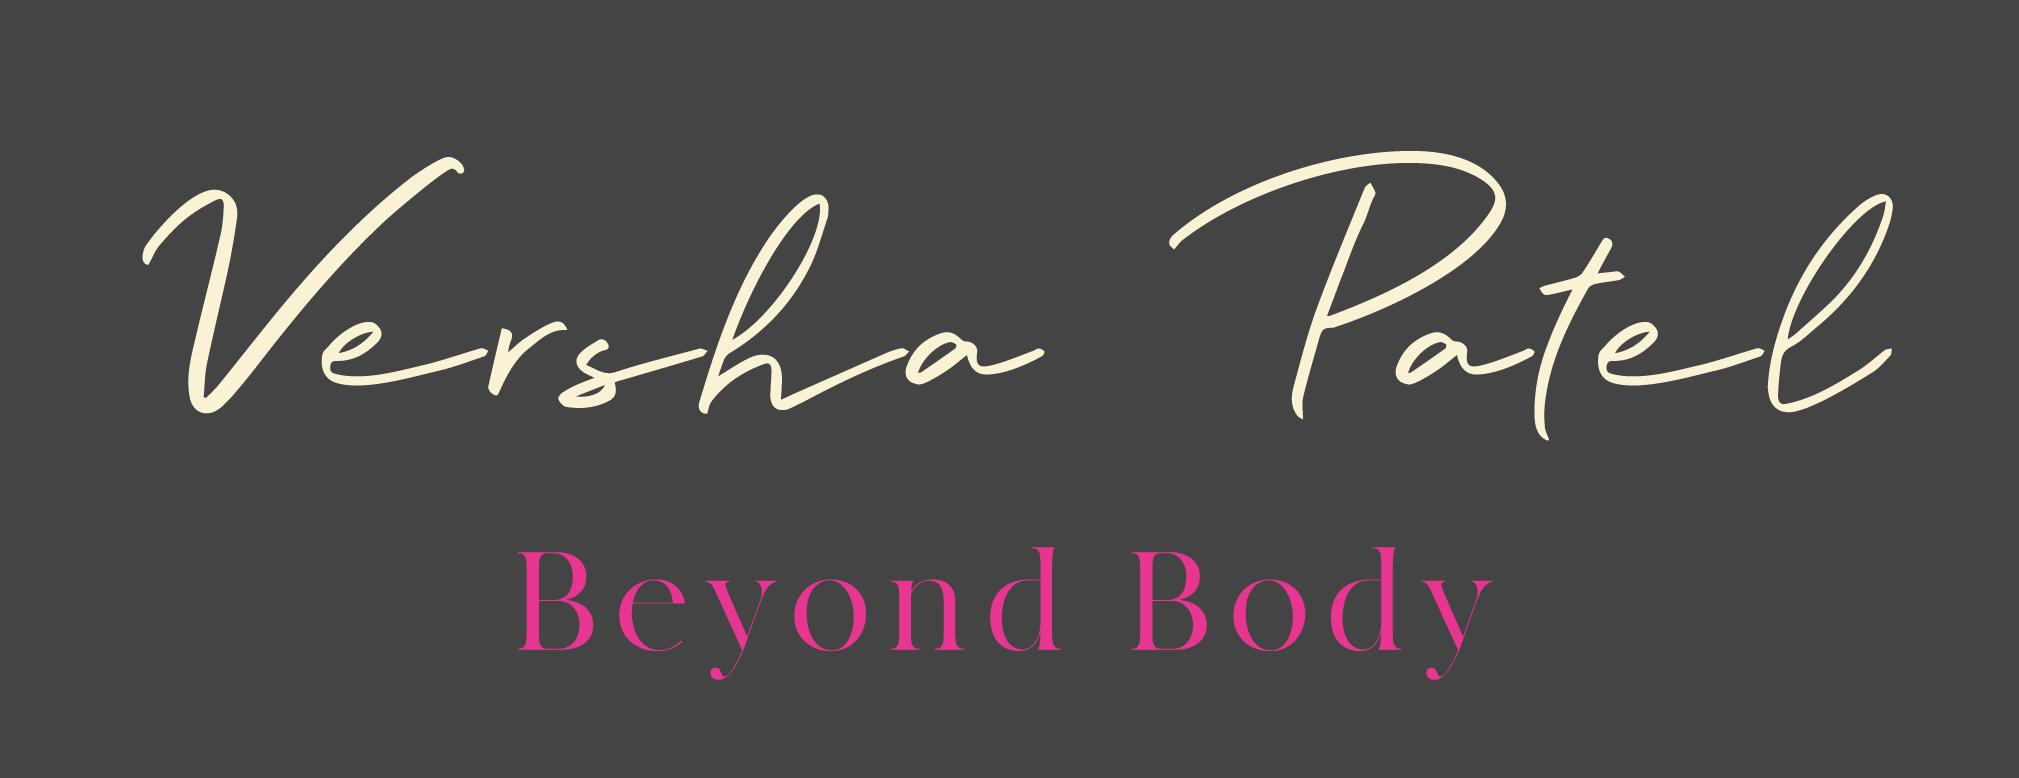 Beyond Body Versha Patel Logo